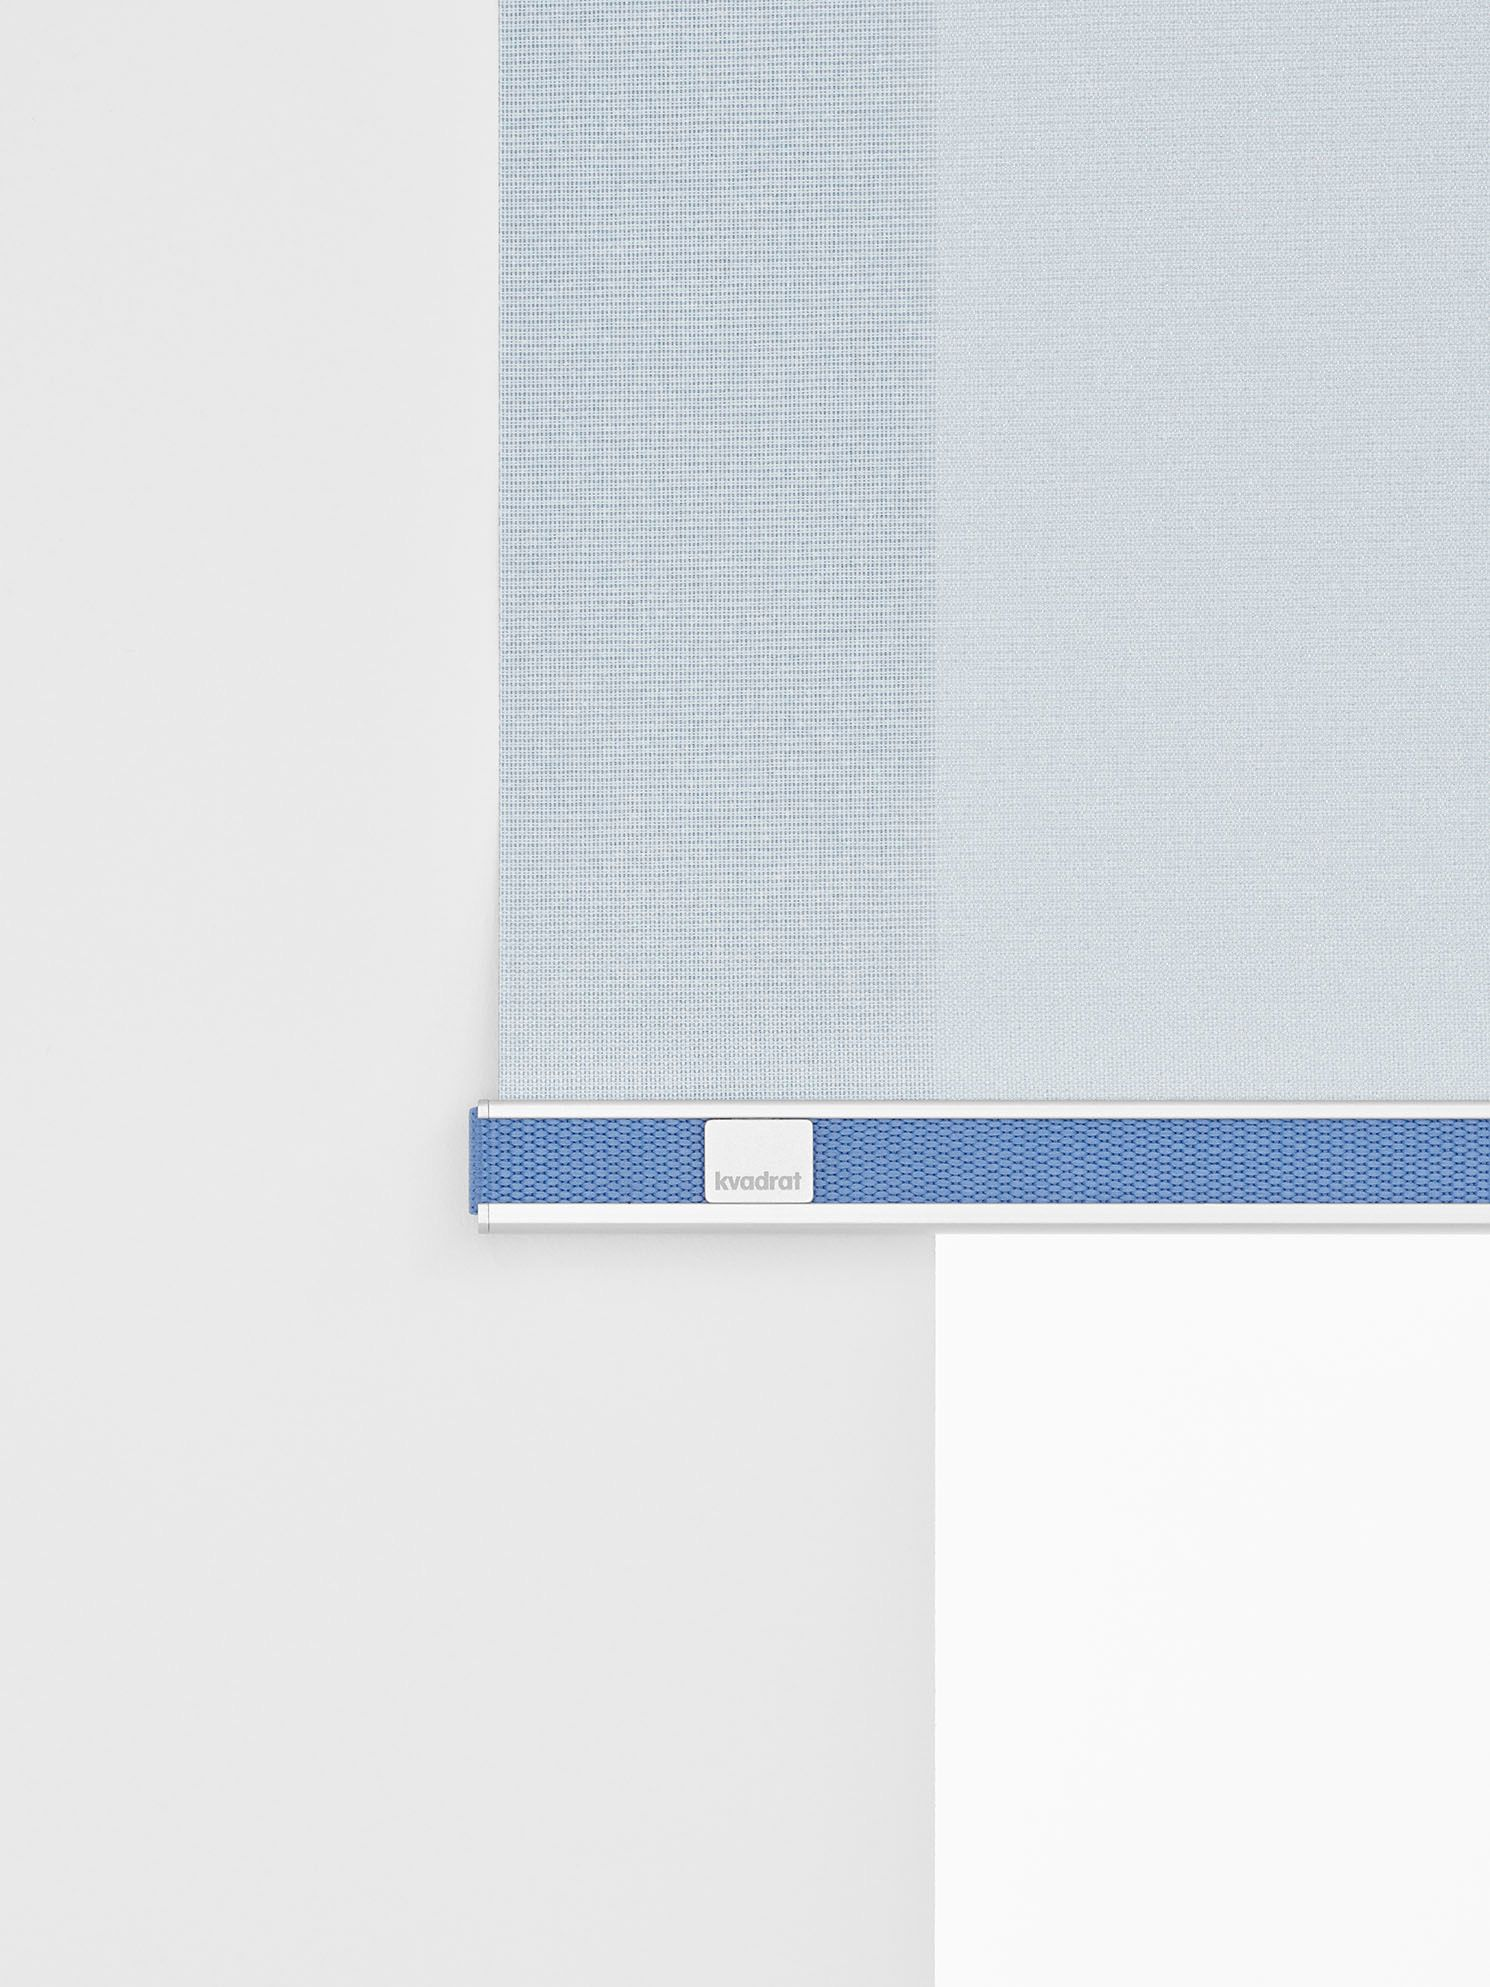 Details Kvadrat Roller Blind Designed By Ronan Erwan Bouroullec